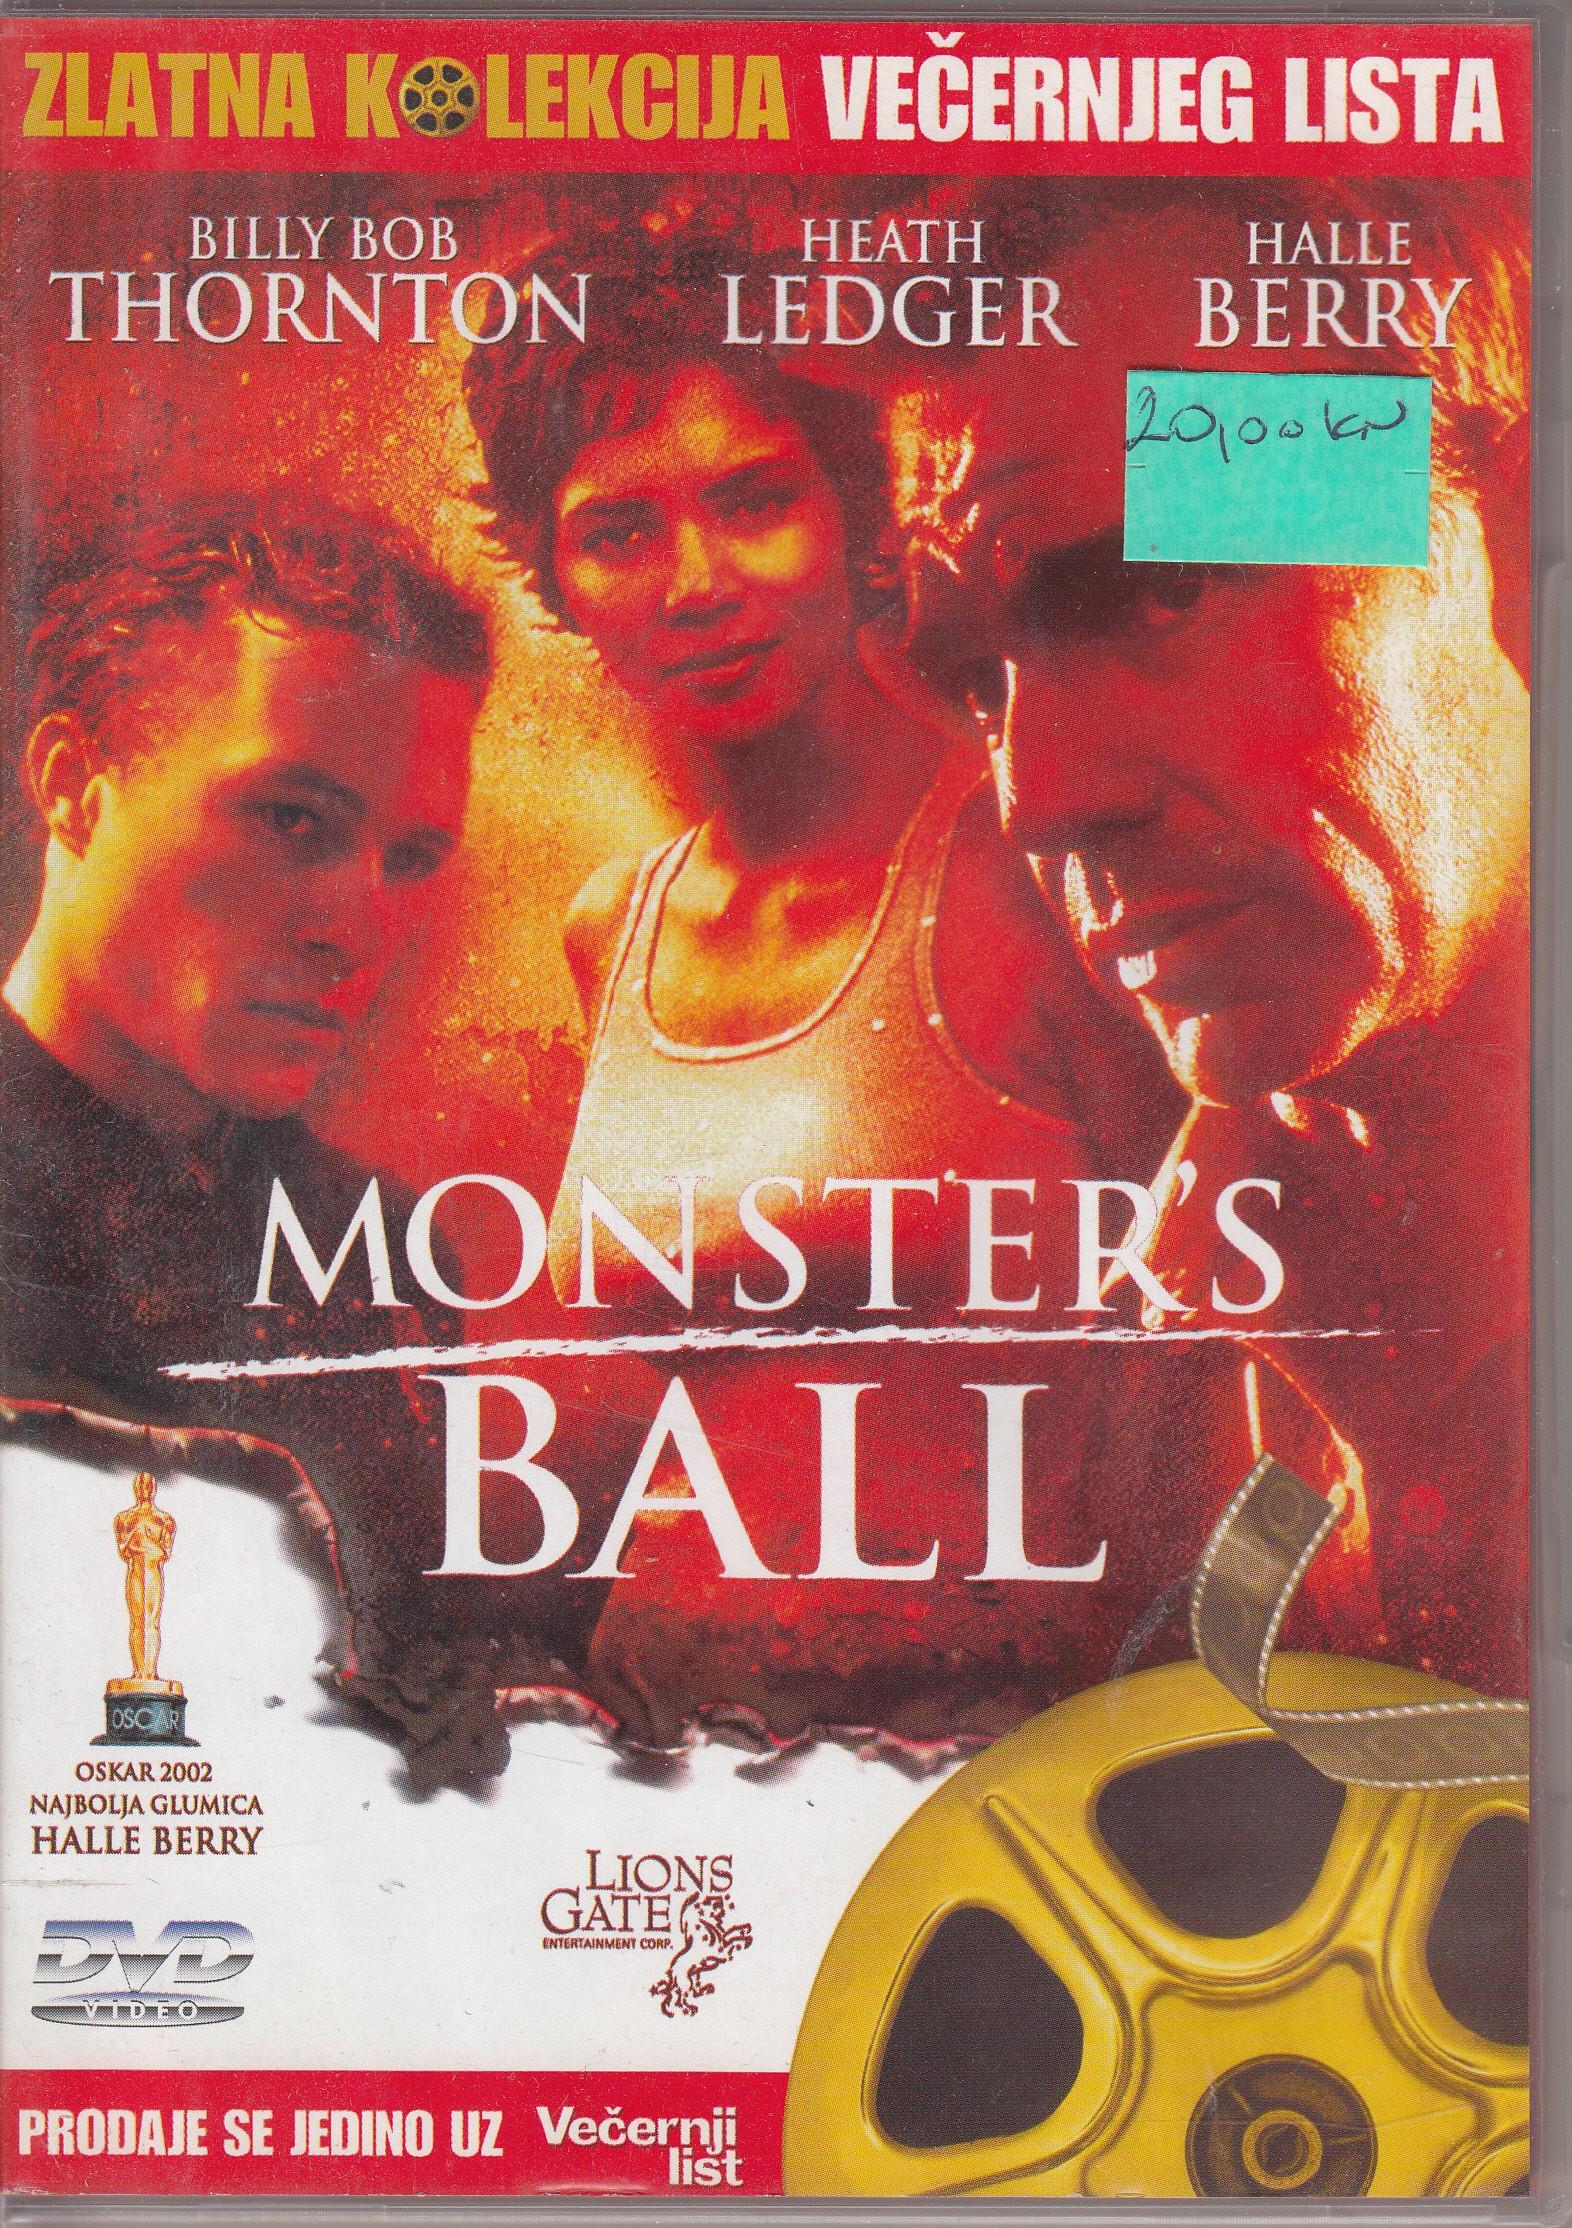 Monsters Ball - Billy Bob Thornton